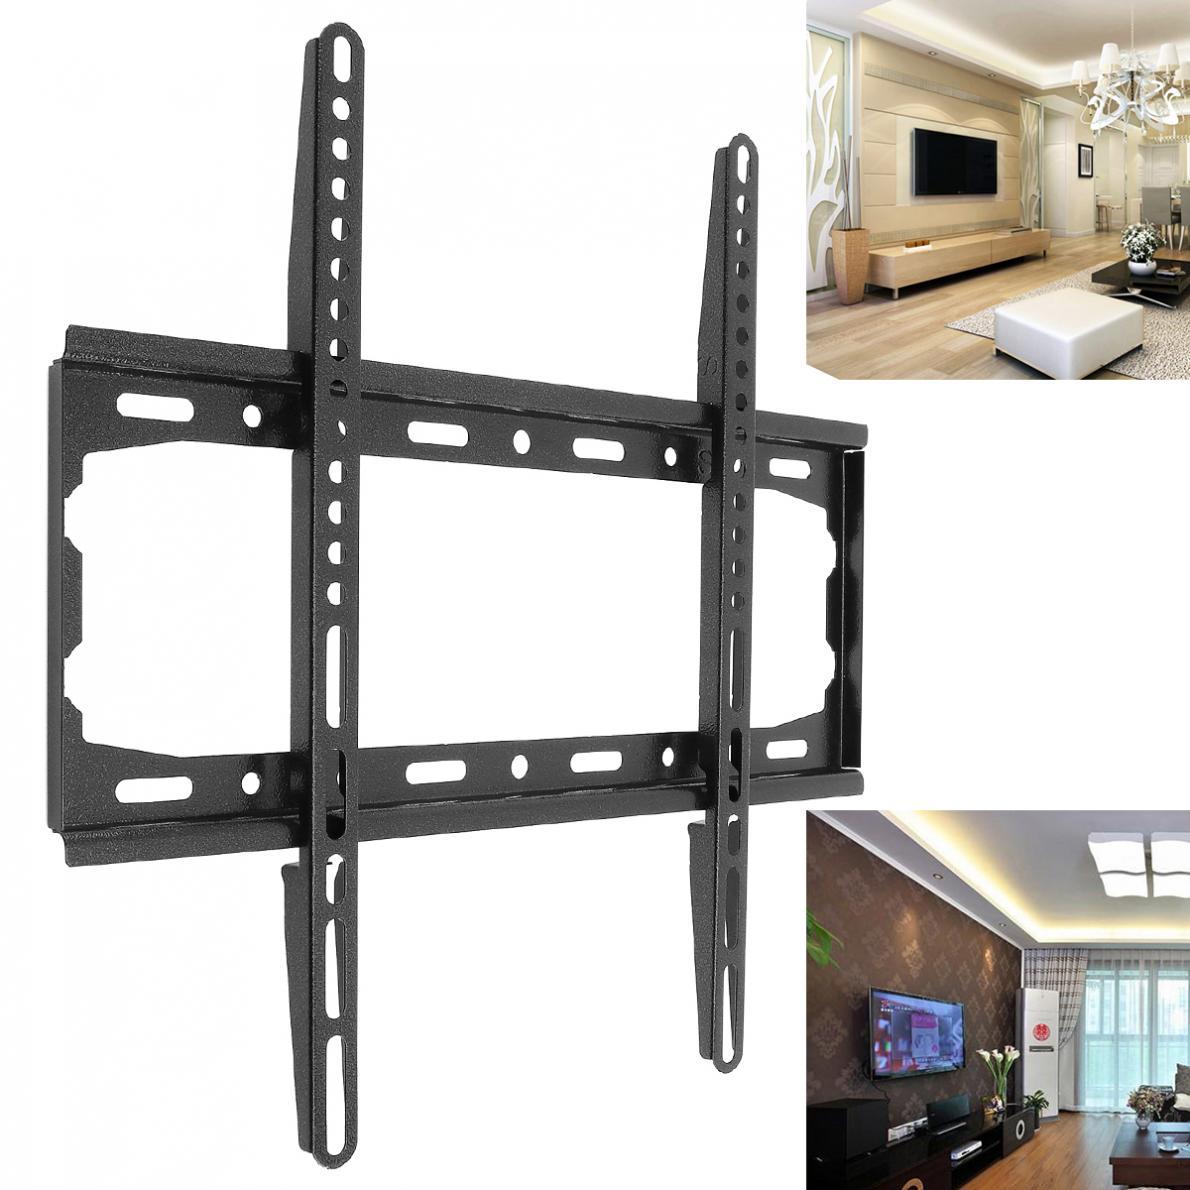 все цены на Universal 45KG TV Wall Mount Bracket Fixed Flat Panel TV Frame for 26-55 Inch LCD LED Monitor Flat Panel TV Stand Holder онлайн